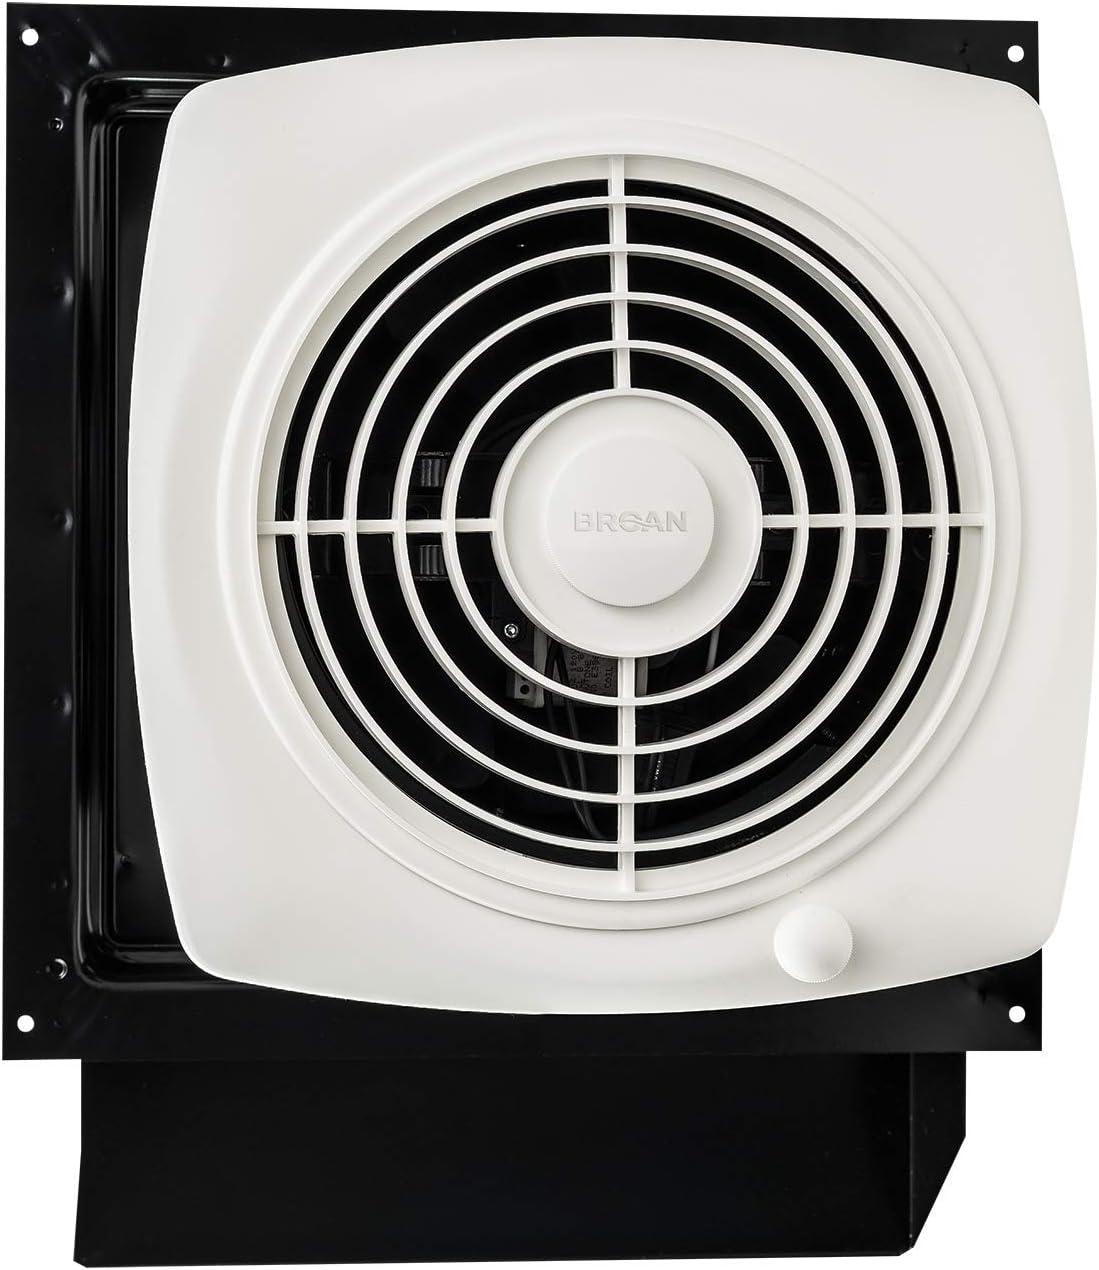 Broan Nutone 509s Through The Wall Ventilation Fan White Square Exhaust Fan 6 5 Sones 180 Cfm 8 Bathroom Fans Amazon Com